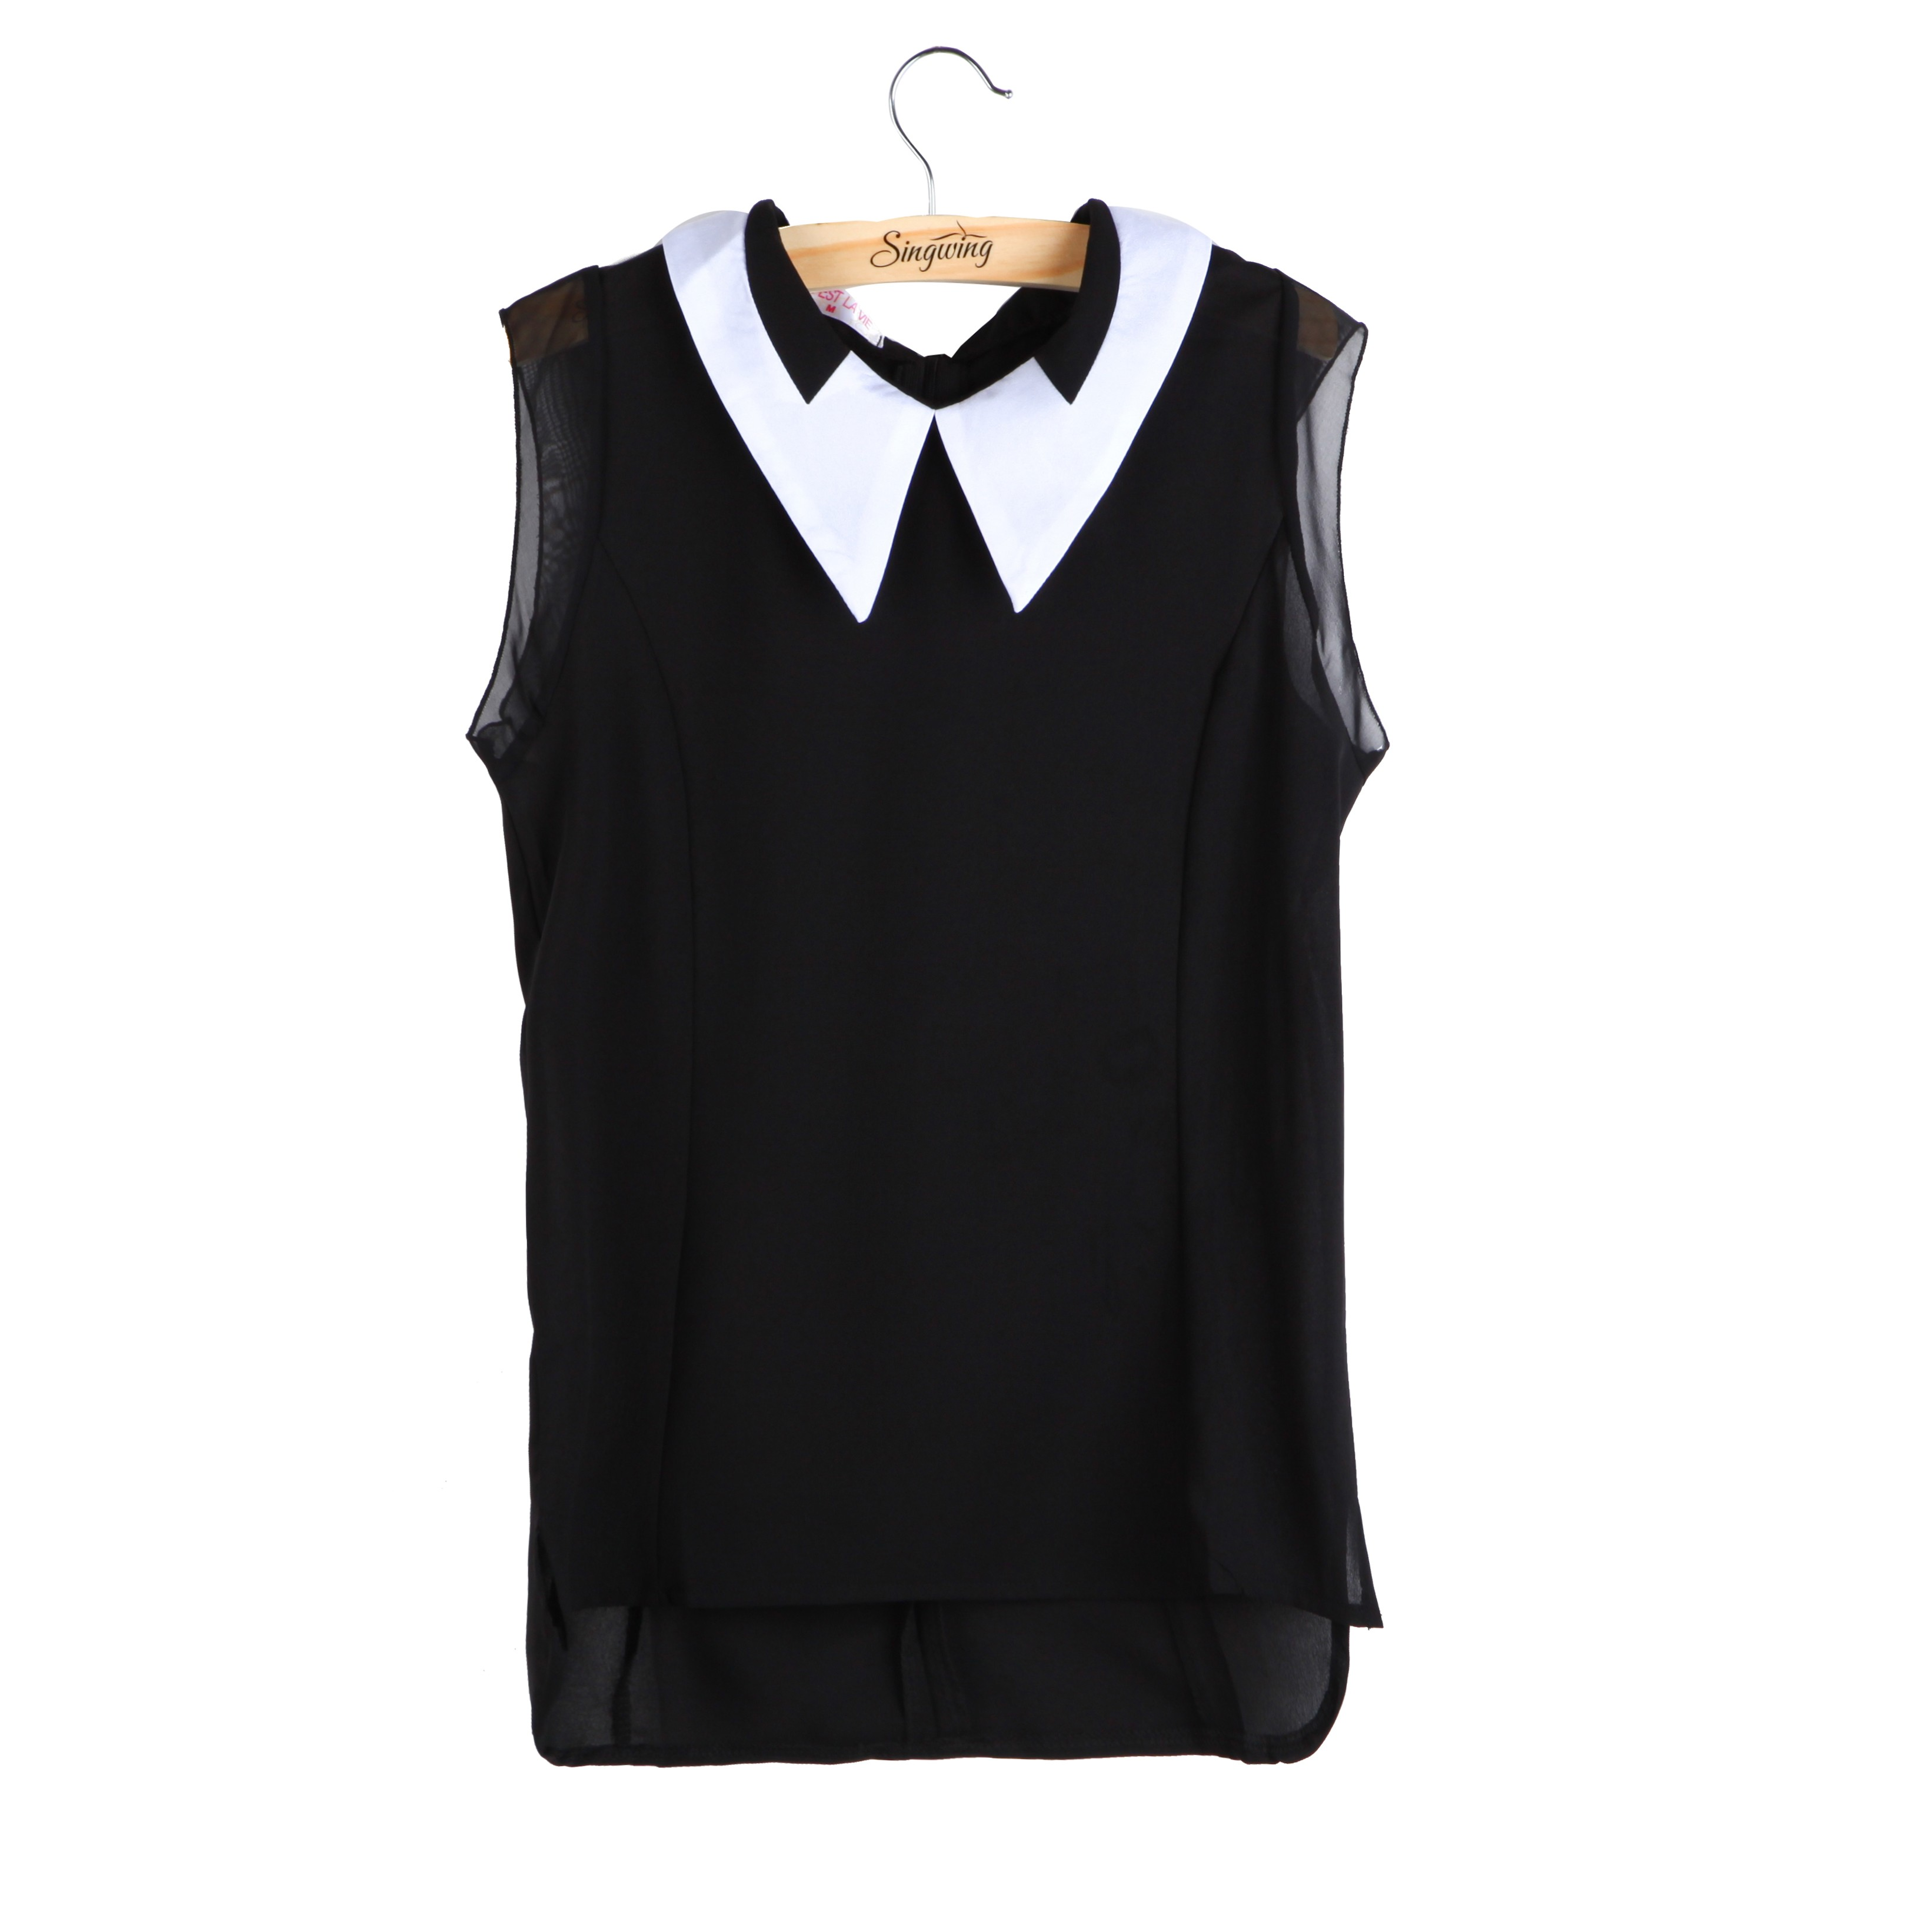 Fashion Cute Shirts Hot Sales Black White Dolled Vest Sleeveless Ladies Snow Spins Chiffon Shirt Square Collar New Summer Blouse(China (Mainland))